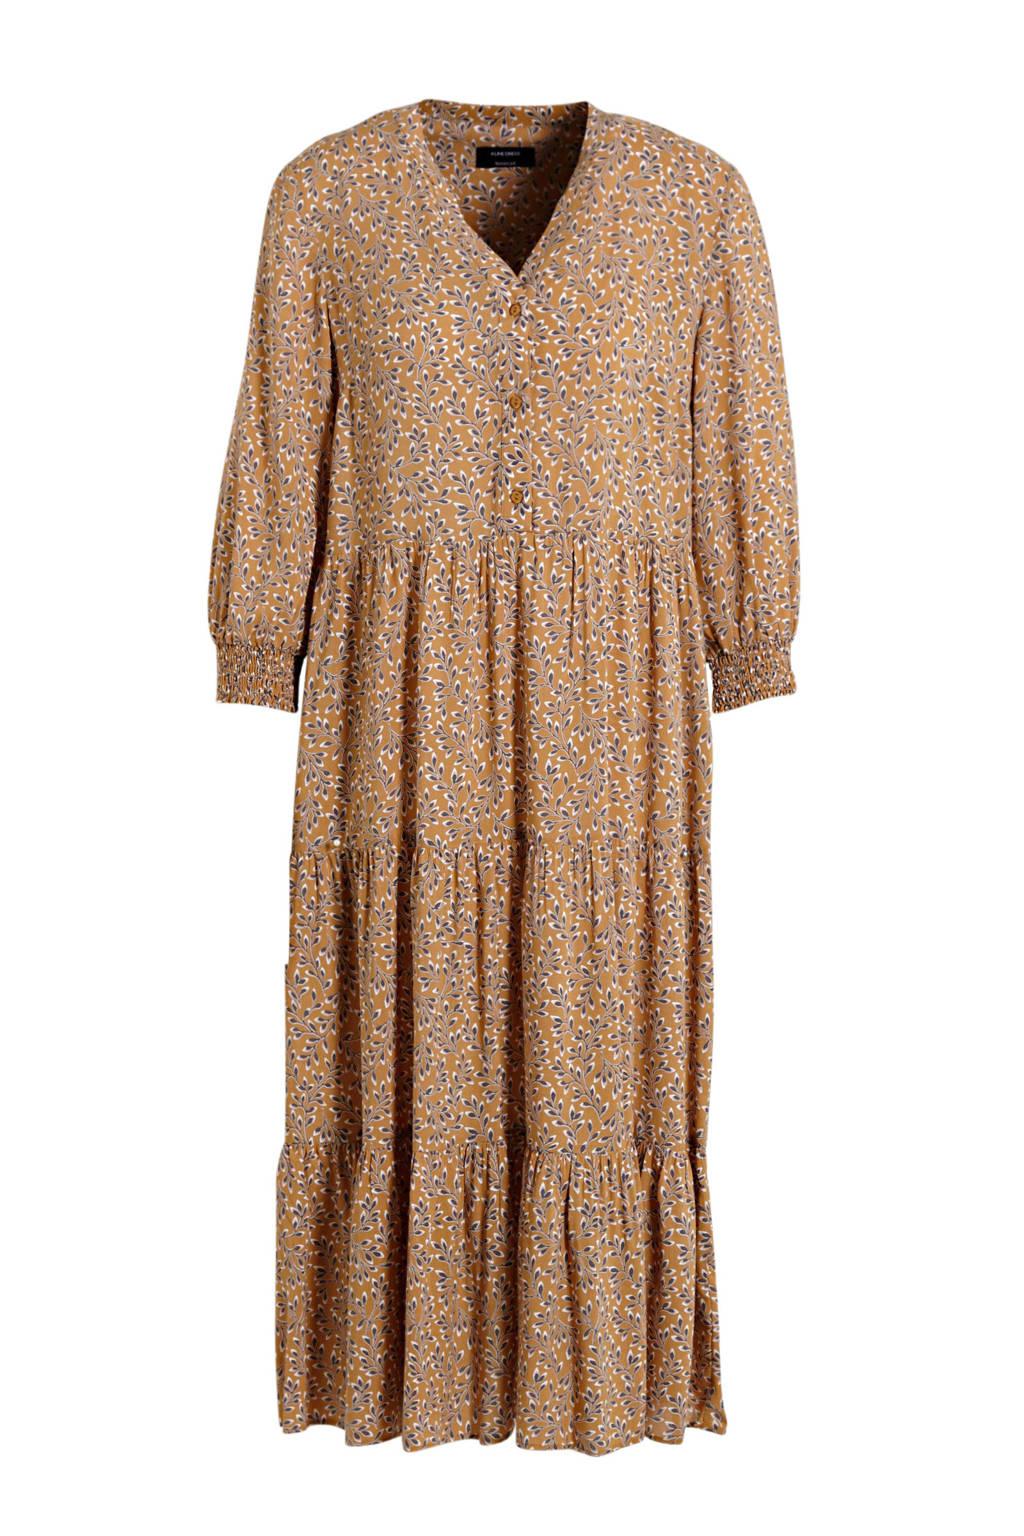 C&A Yessica maxi jurk met all over print en volant lichtbruin/donkerblauw/wit, Lichtbruin/donkerblauw/wit